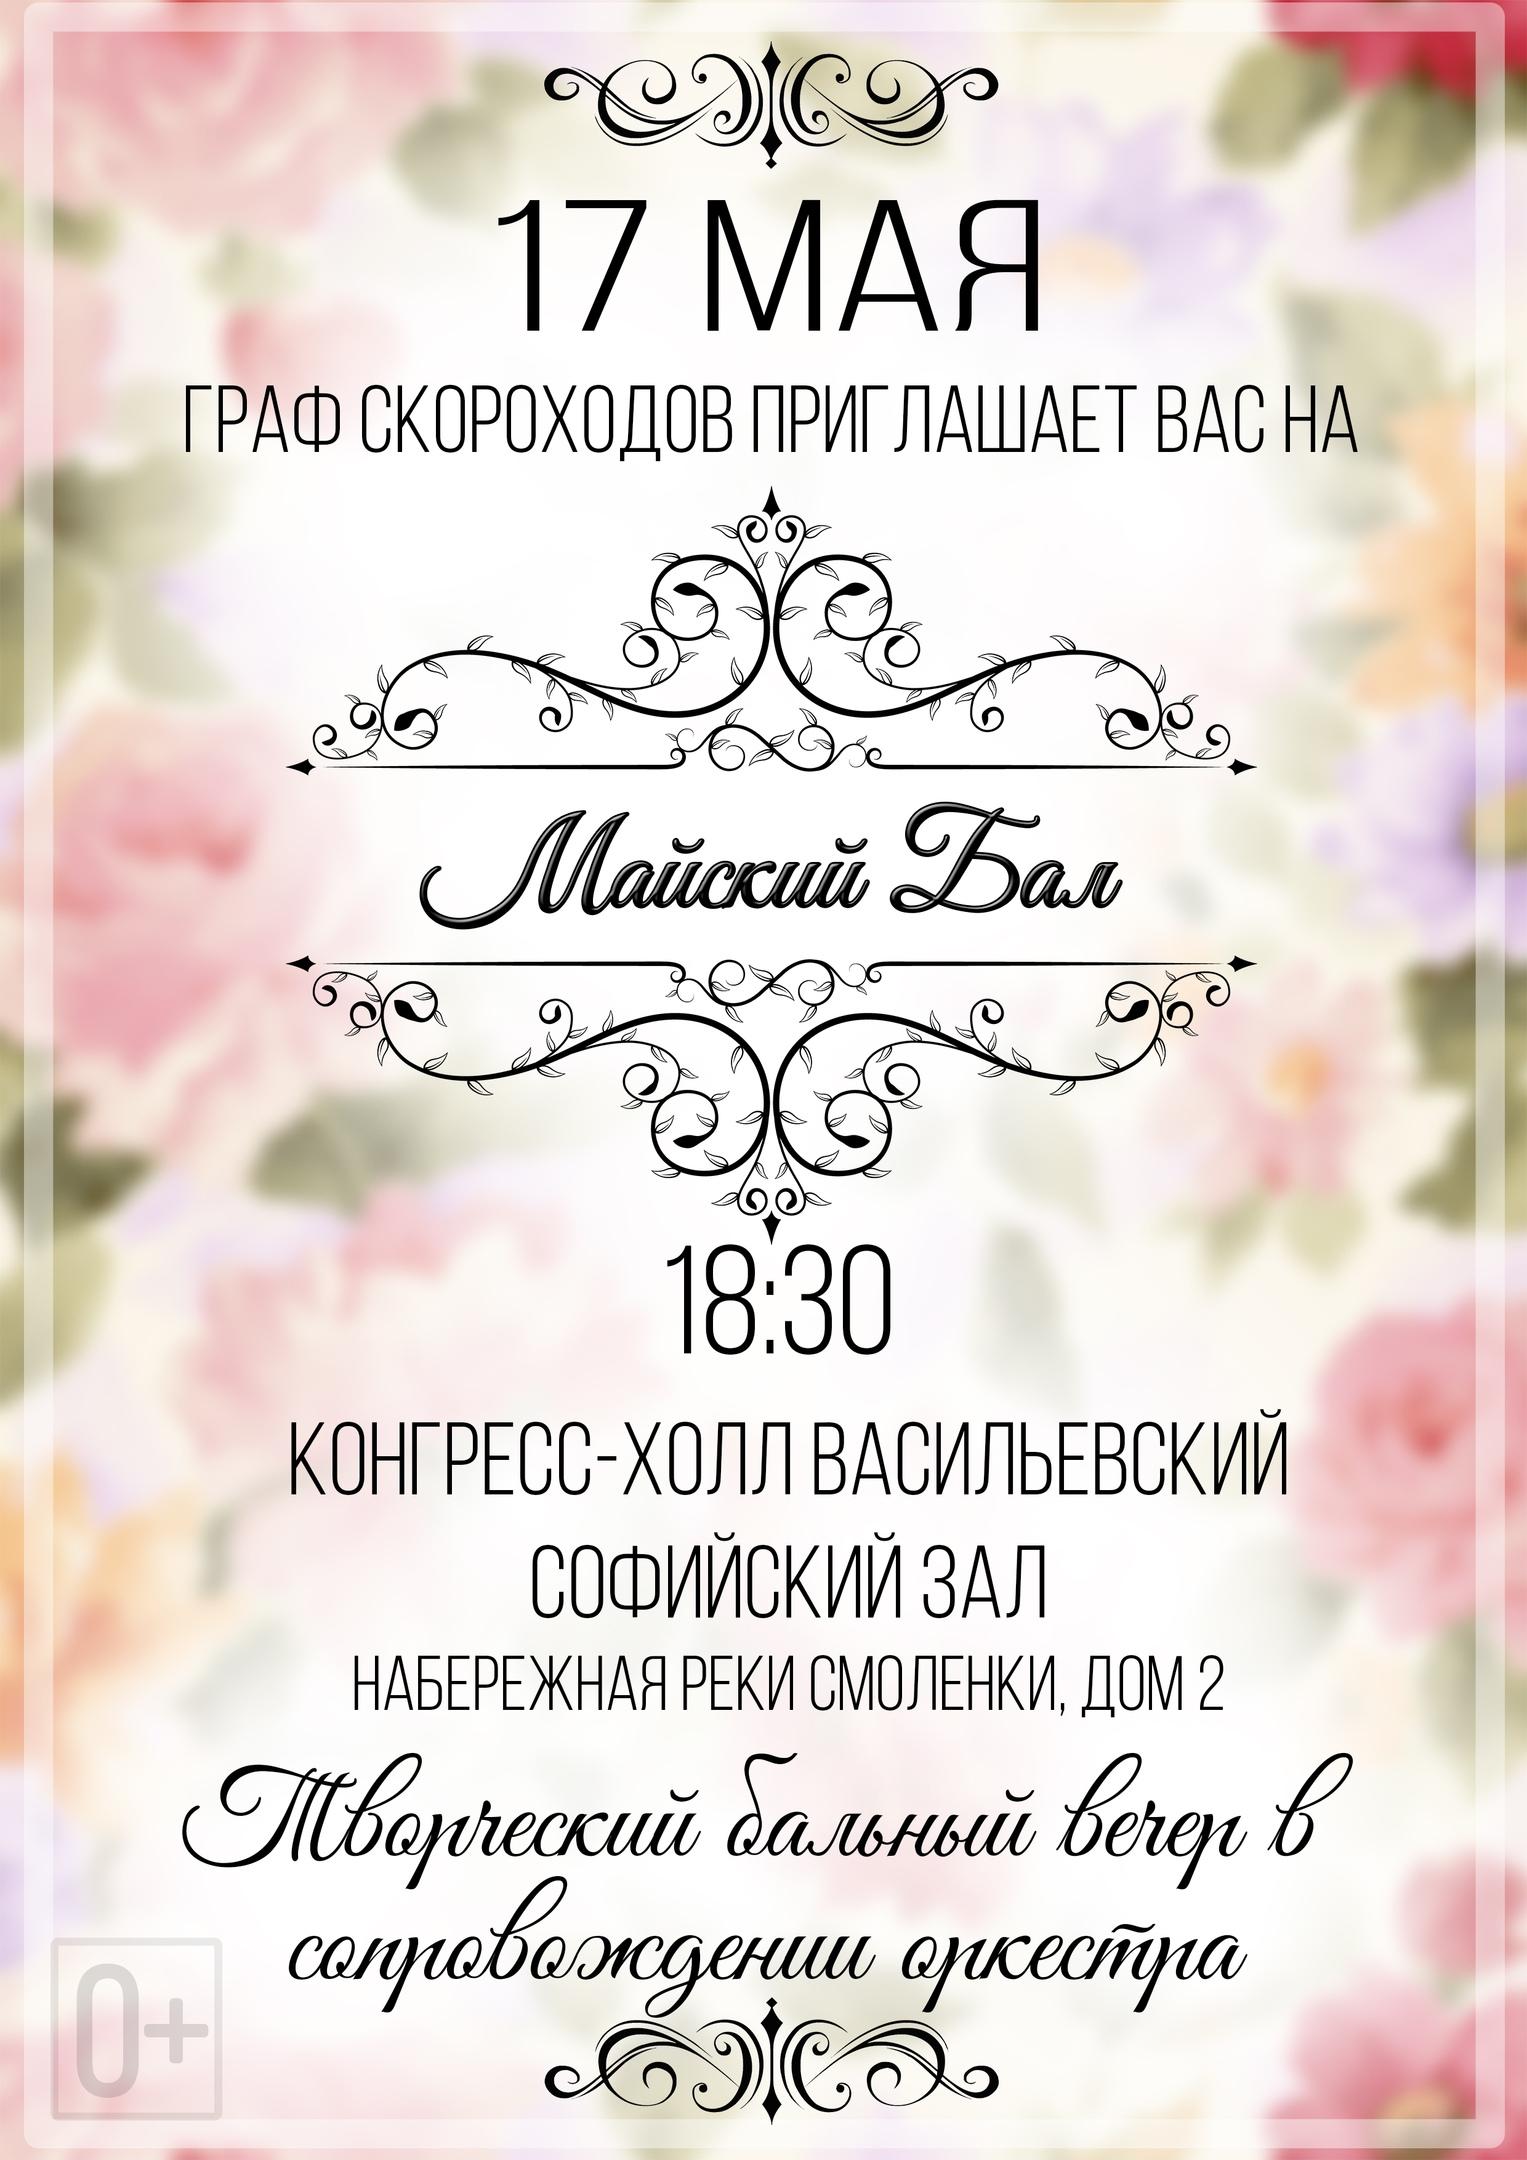 Афиша Майского бала графа Скороходова